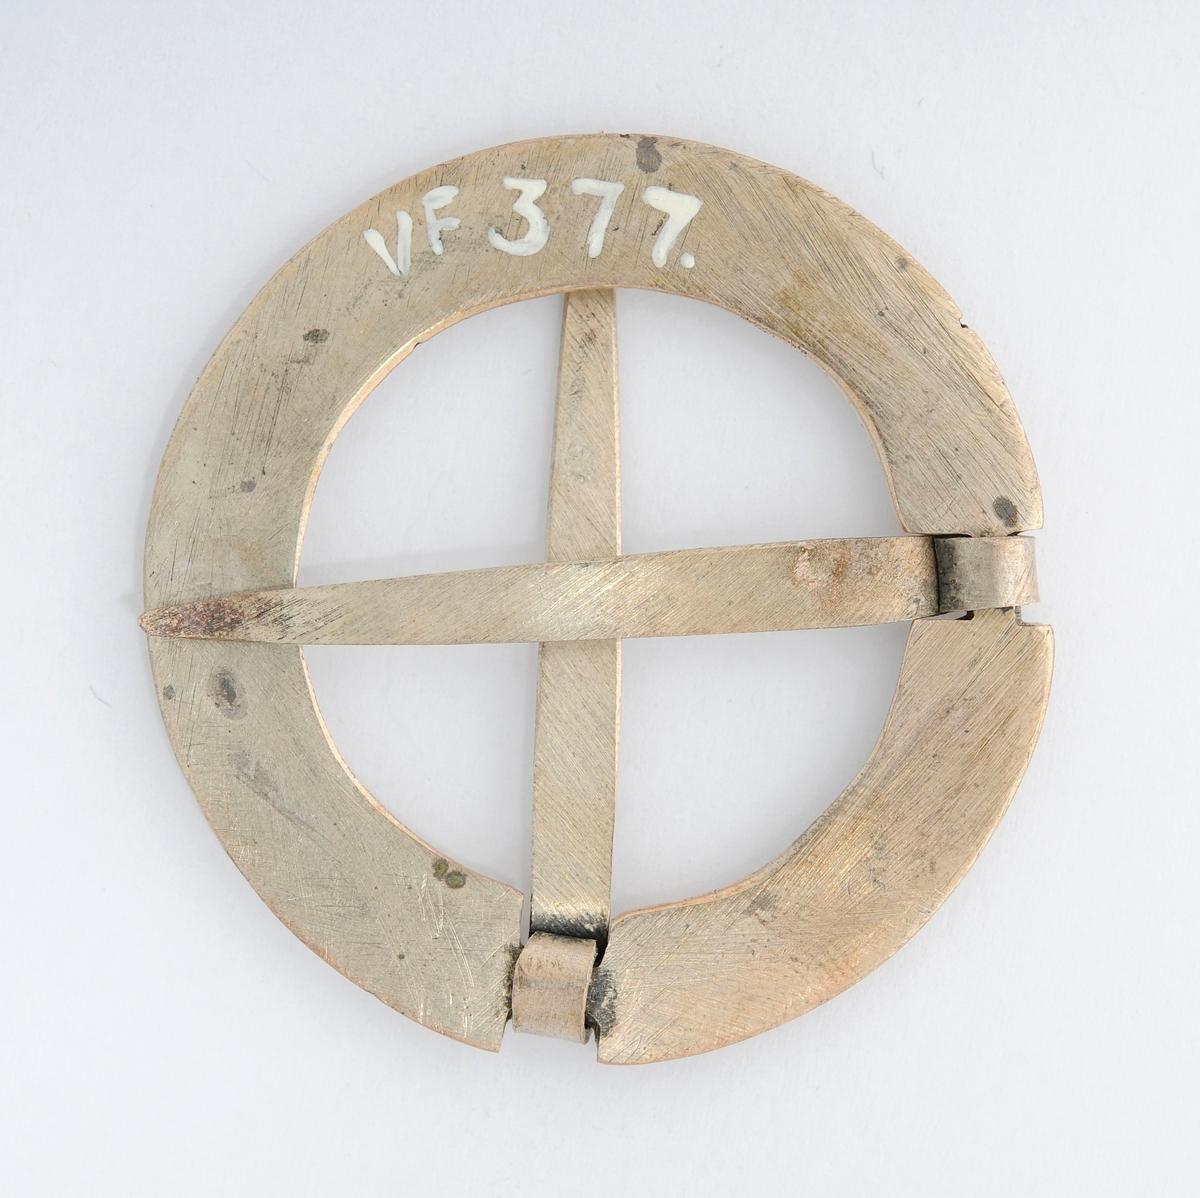 Sølje, krossnål i sølv (utan stempel). Rund, (støypt ?) med to nåler i kors. Gravert rosemønster på framsida. Glatt på baksida.